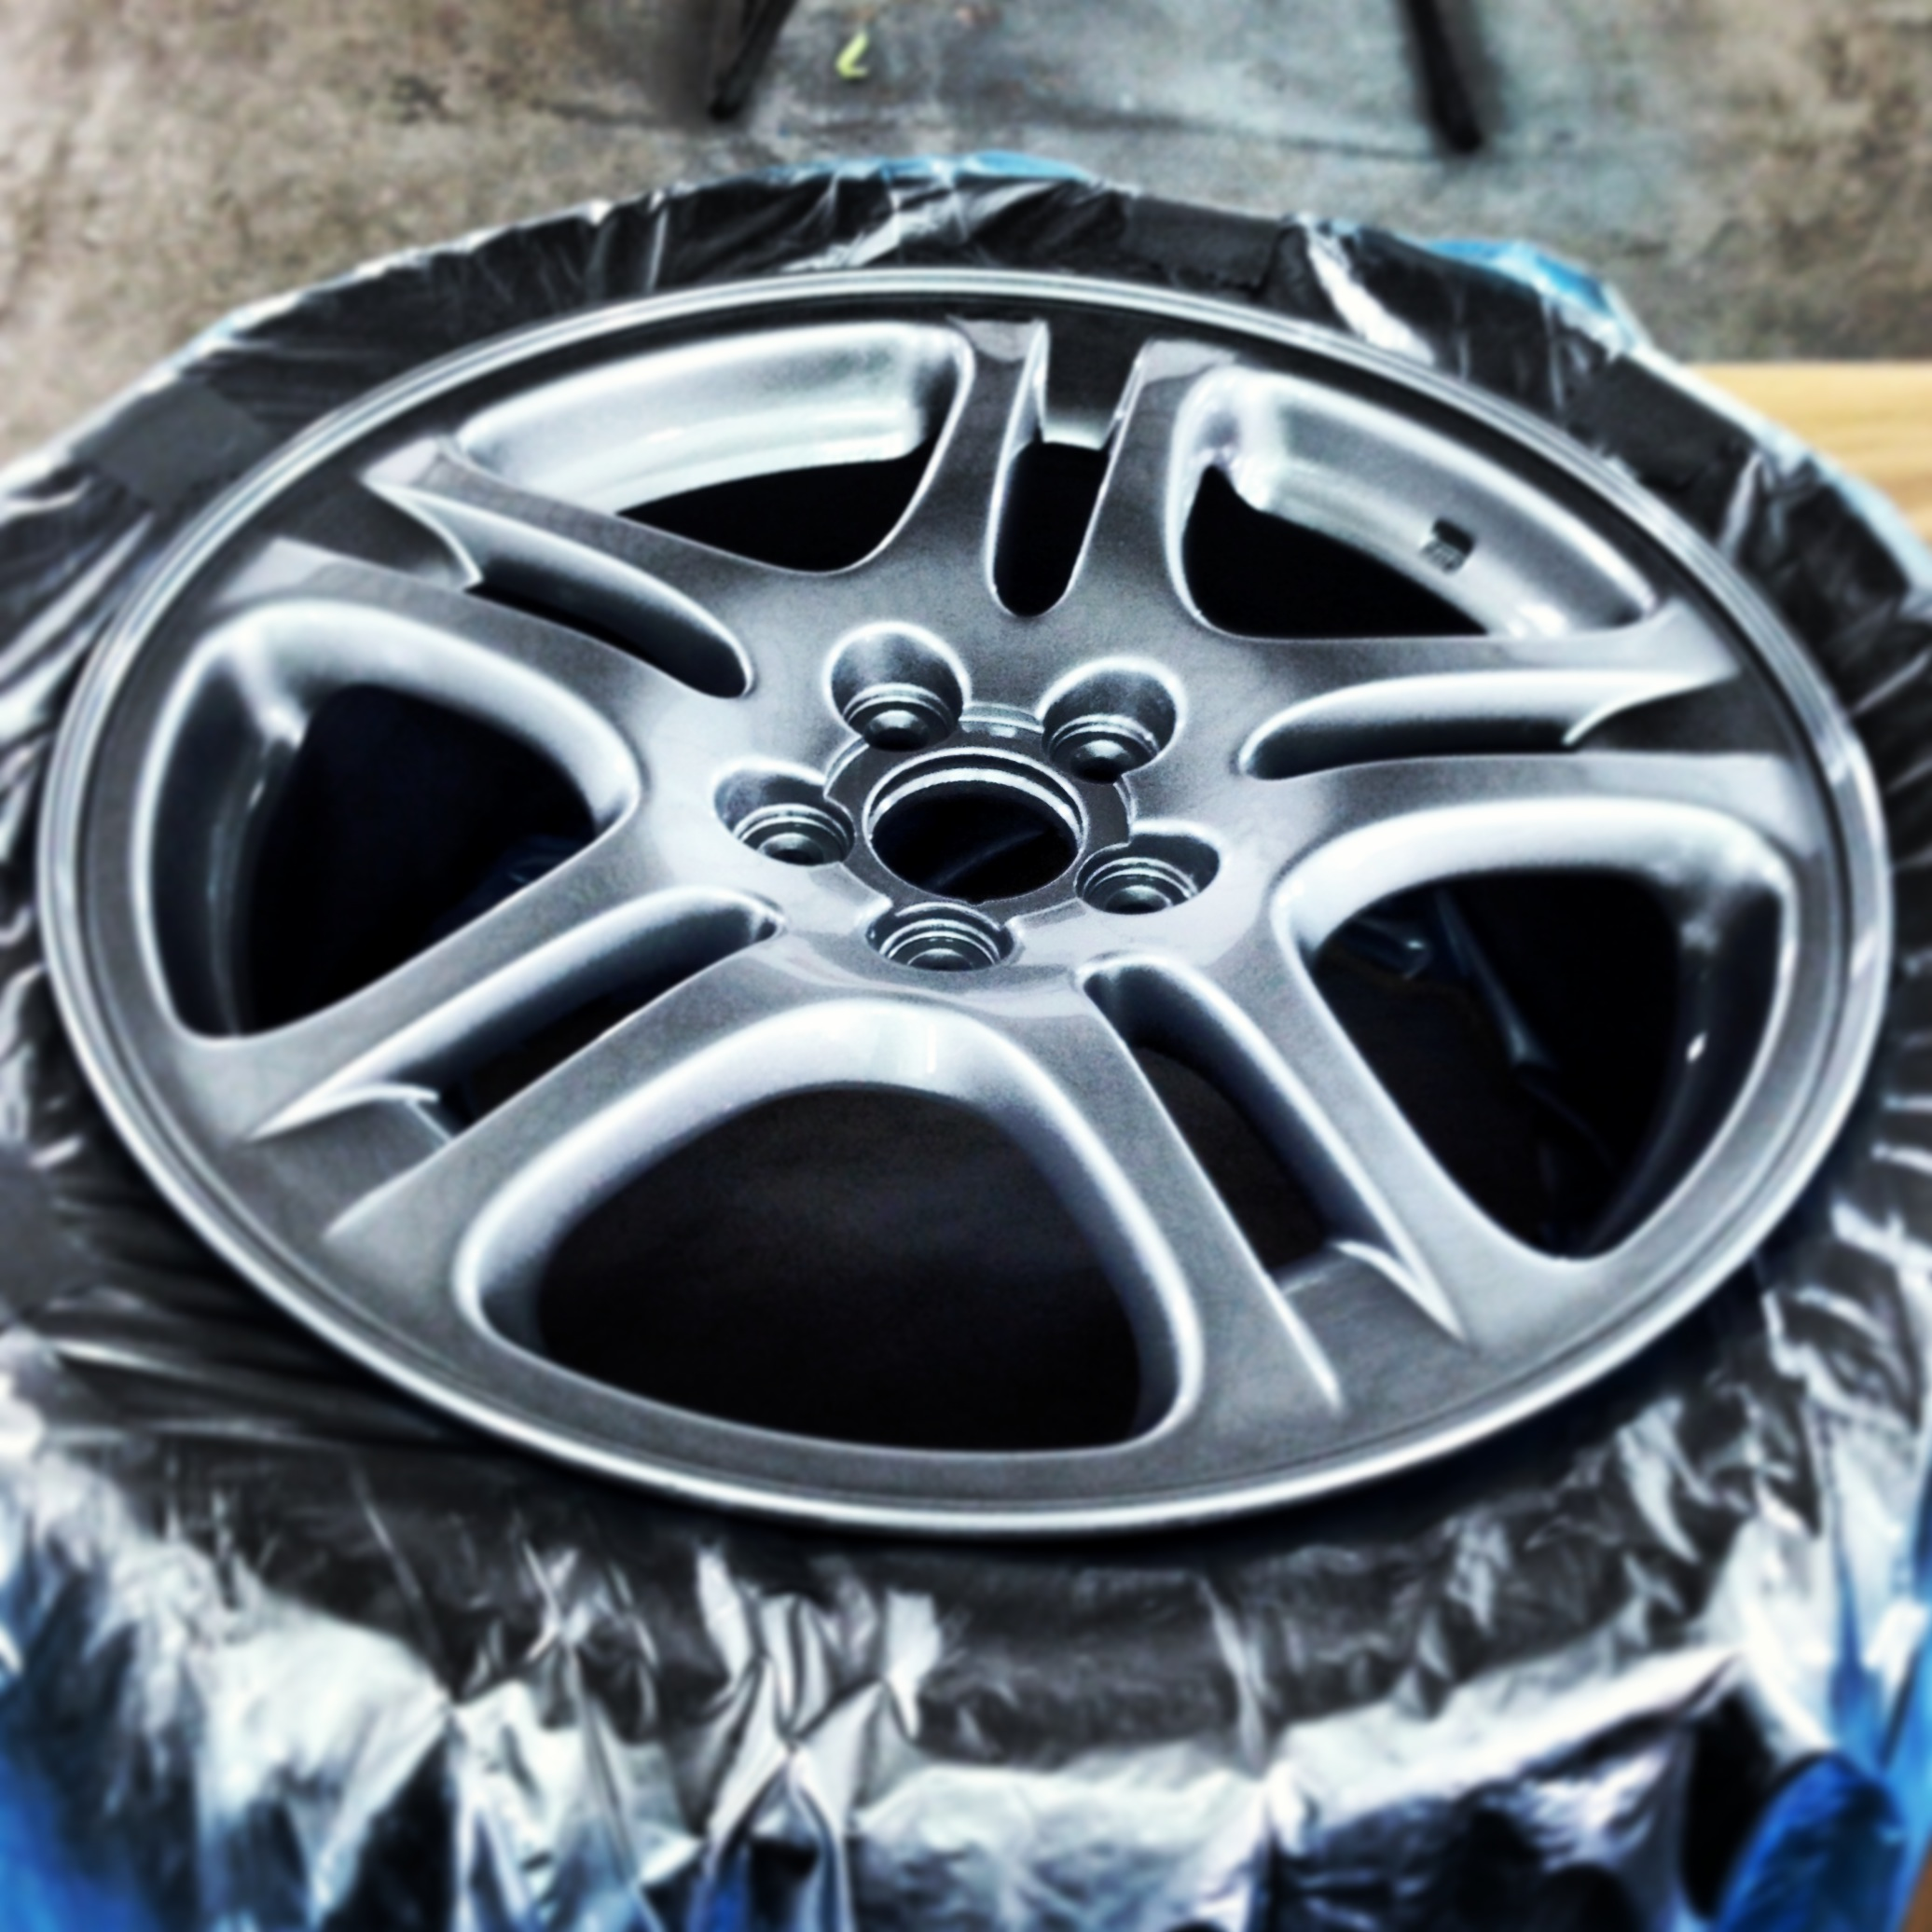 Subaru Impreza - Alloy Repaint